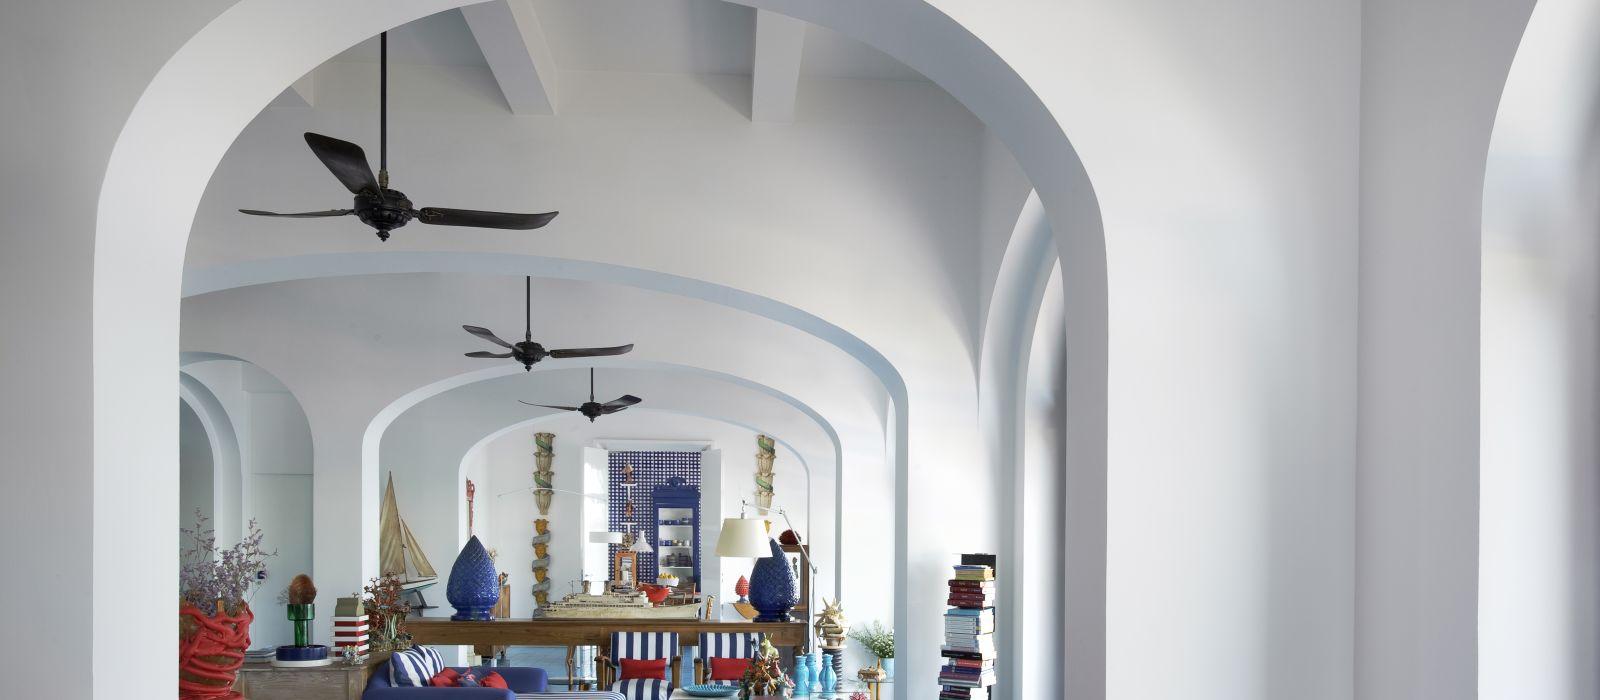 Hotel Maison la Minervetta Italy